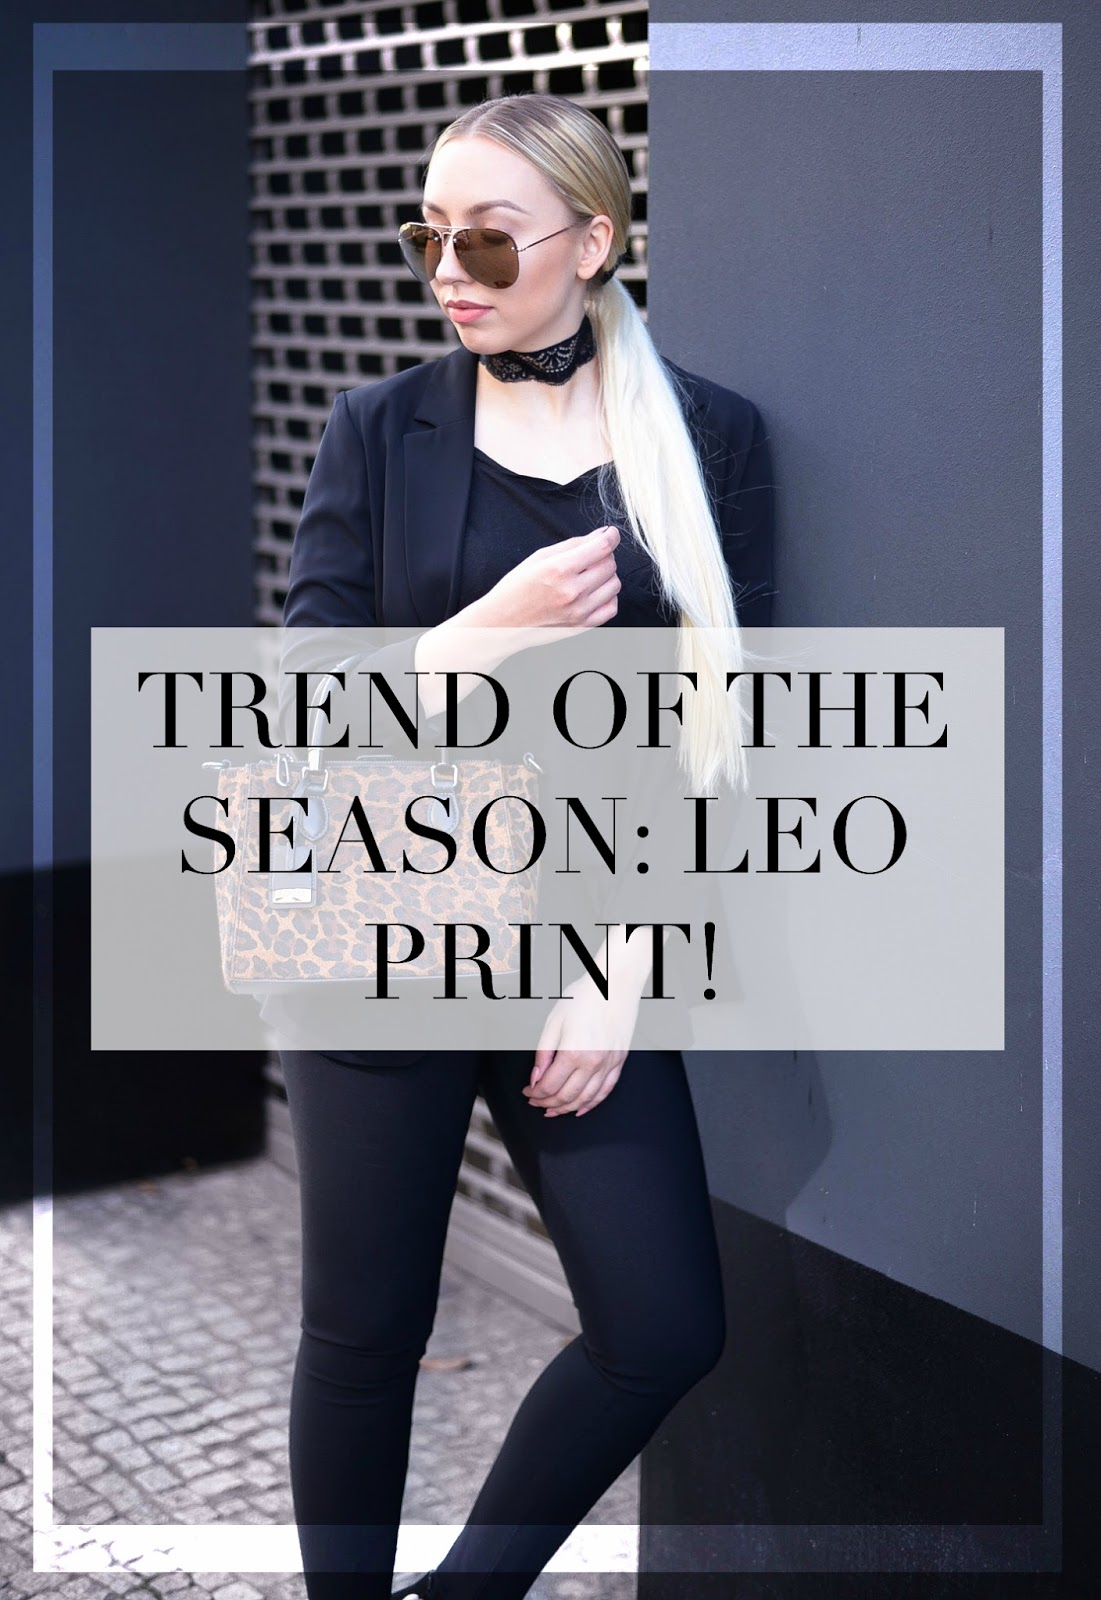 trend of the season: leo print